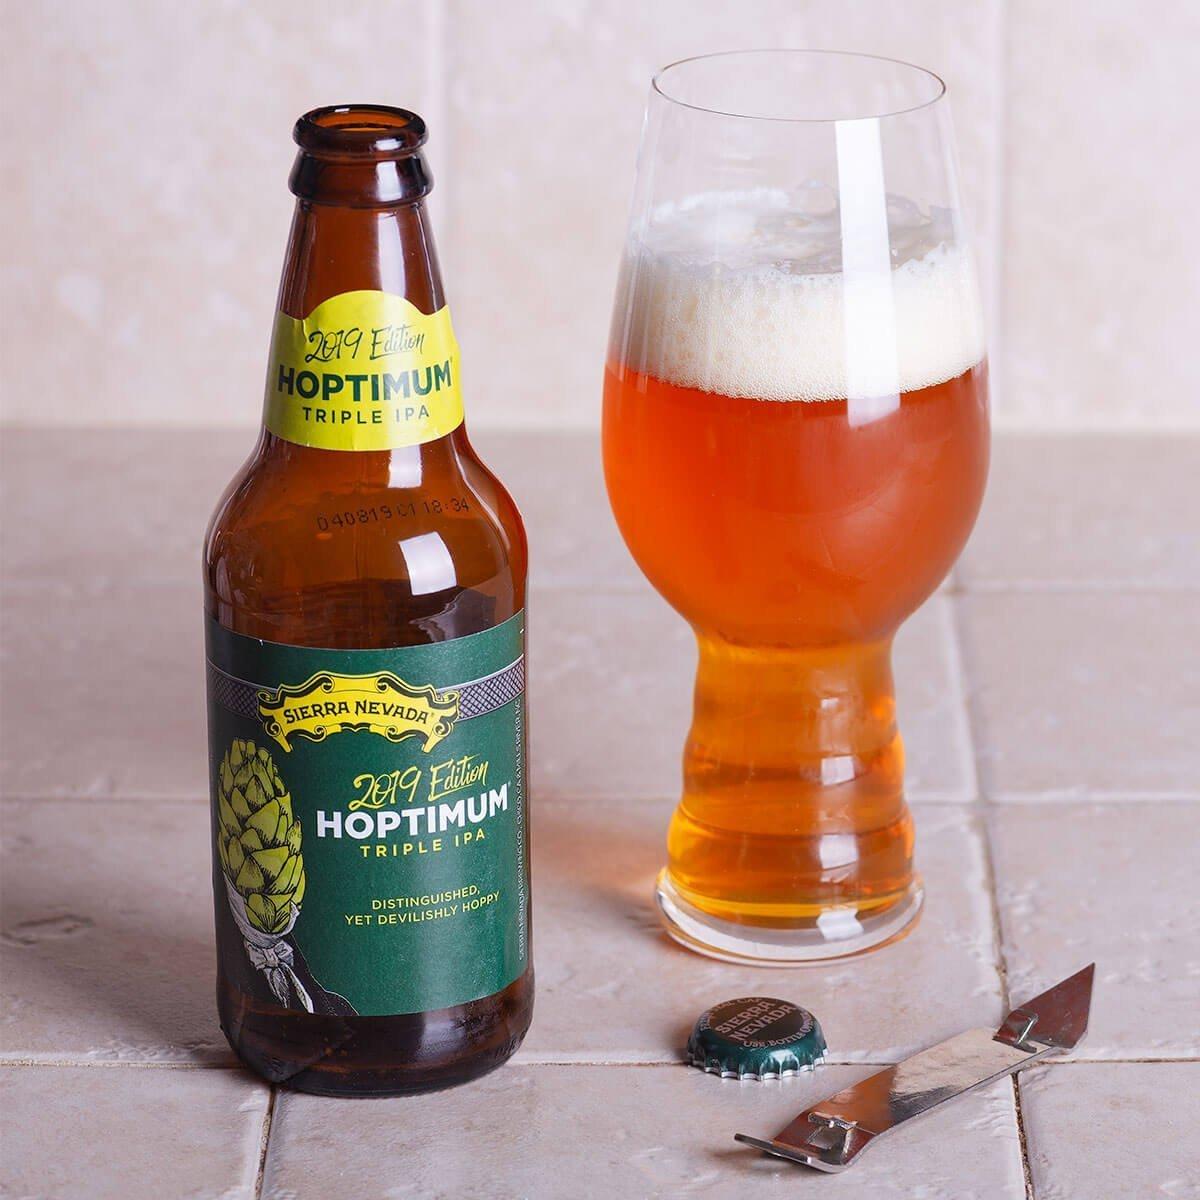 The Hoptimum Triple IPA brewed by Sierra Nevada Brewing Co. strikes a wonderful balance between hops, malt, and boozy strength.